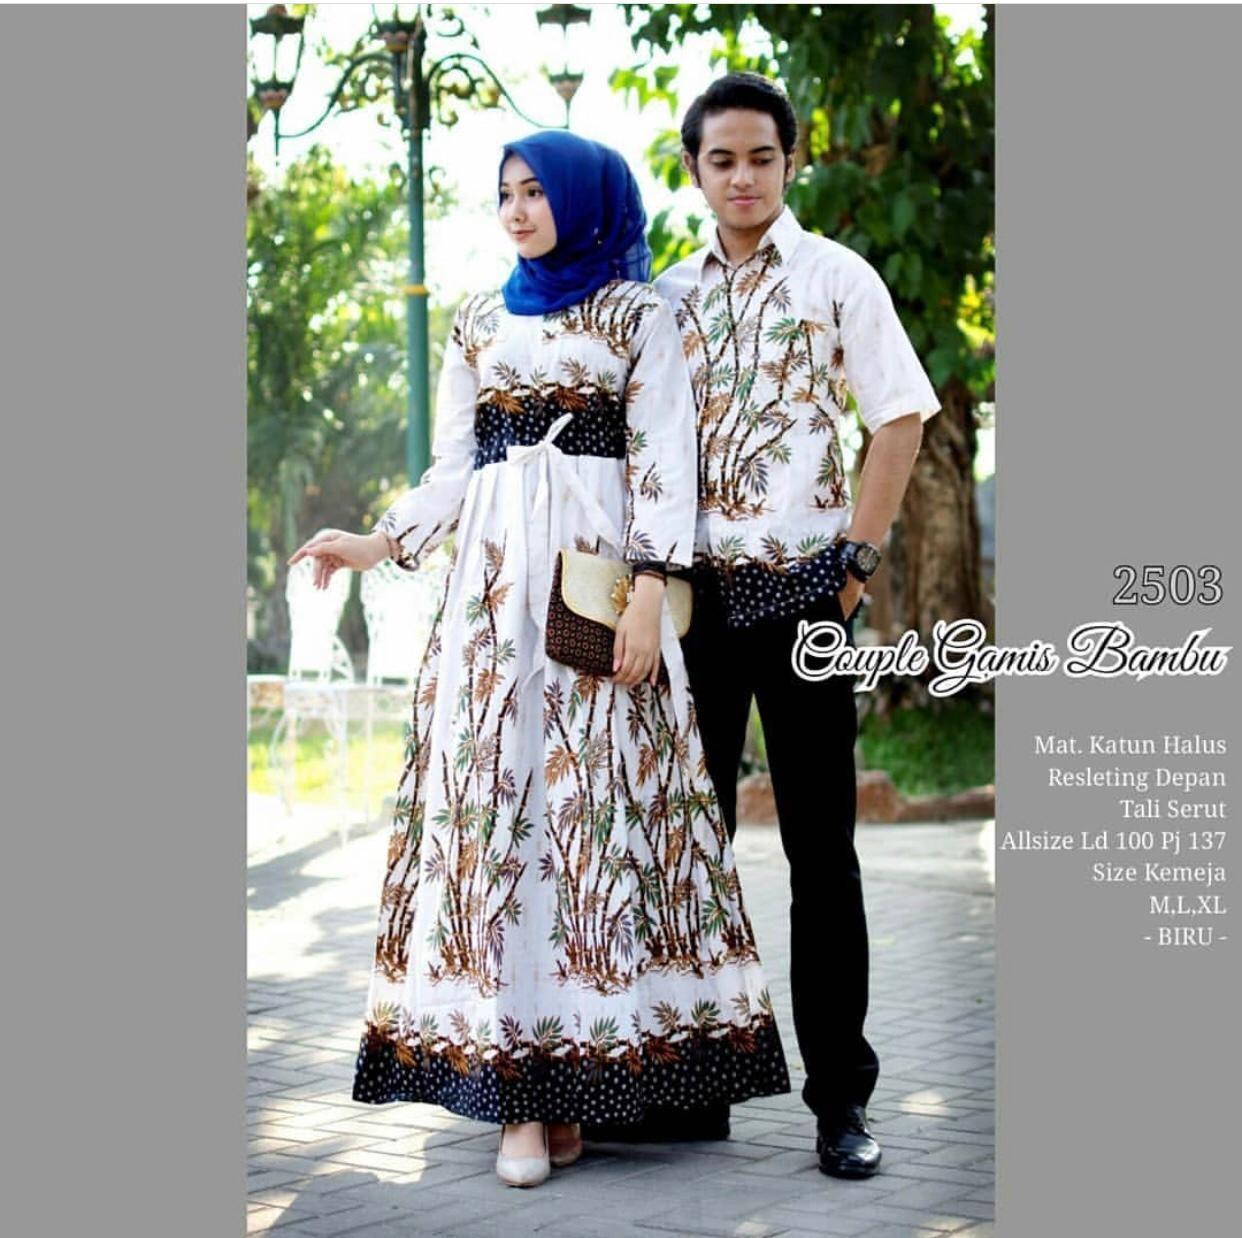 TERMURAH (COD) !!! - Batik Couple / Couple Batik / Baju Muslim Wanita Terbaru 2019 / Batik Murah / Batik Sarimbit / Baju Batik Modern / Baju Modern / Batik Kondangan / Batik Keluarga / Batik Pekalongan - Batik Solo - Baju Batik Couple Gamis Bambu